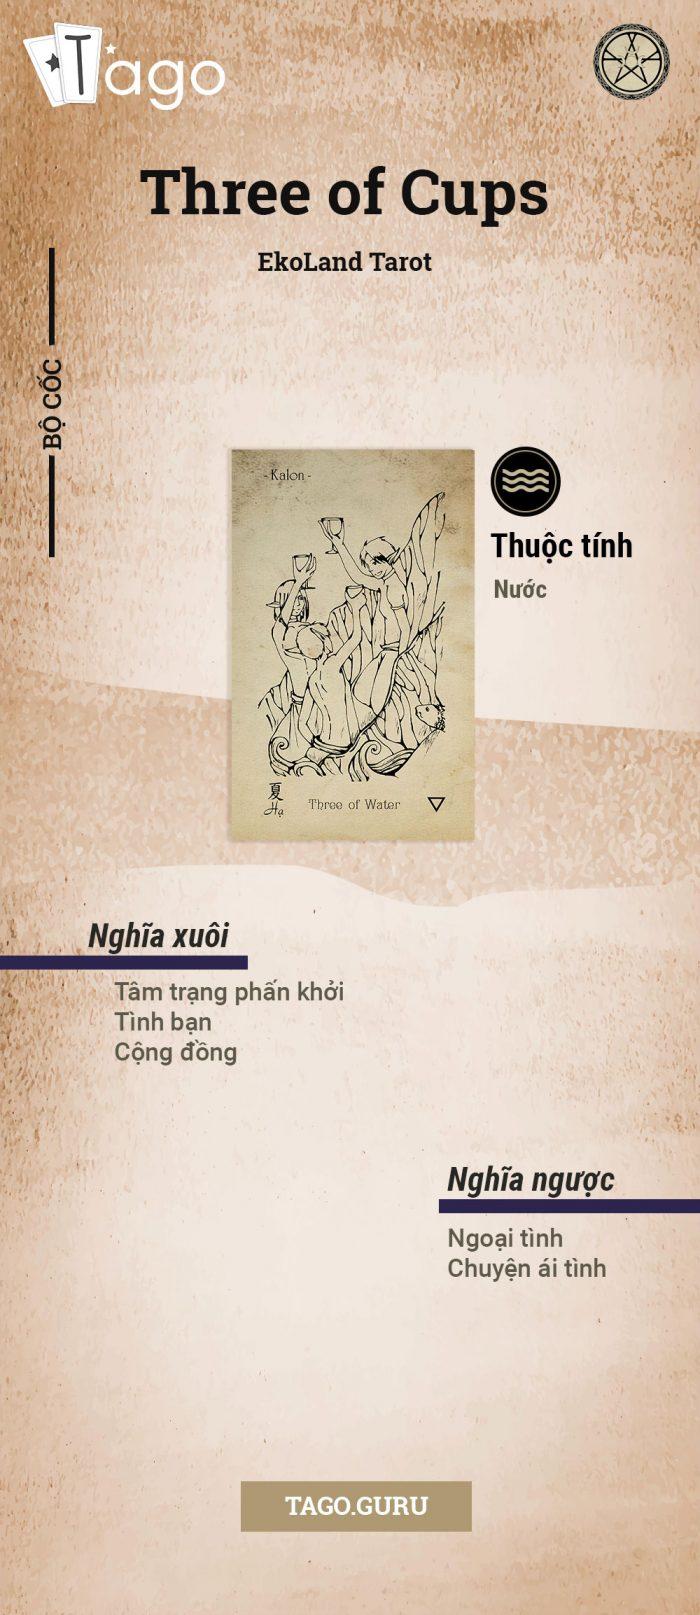 TAGO-Info-Bai-Tarot-Three-of-cups